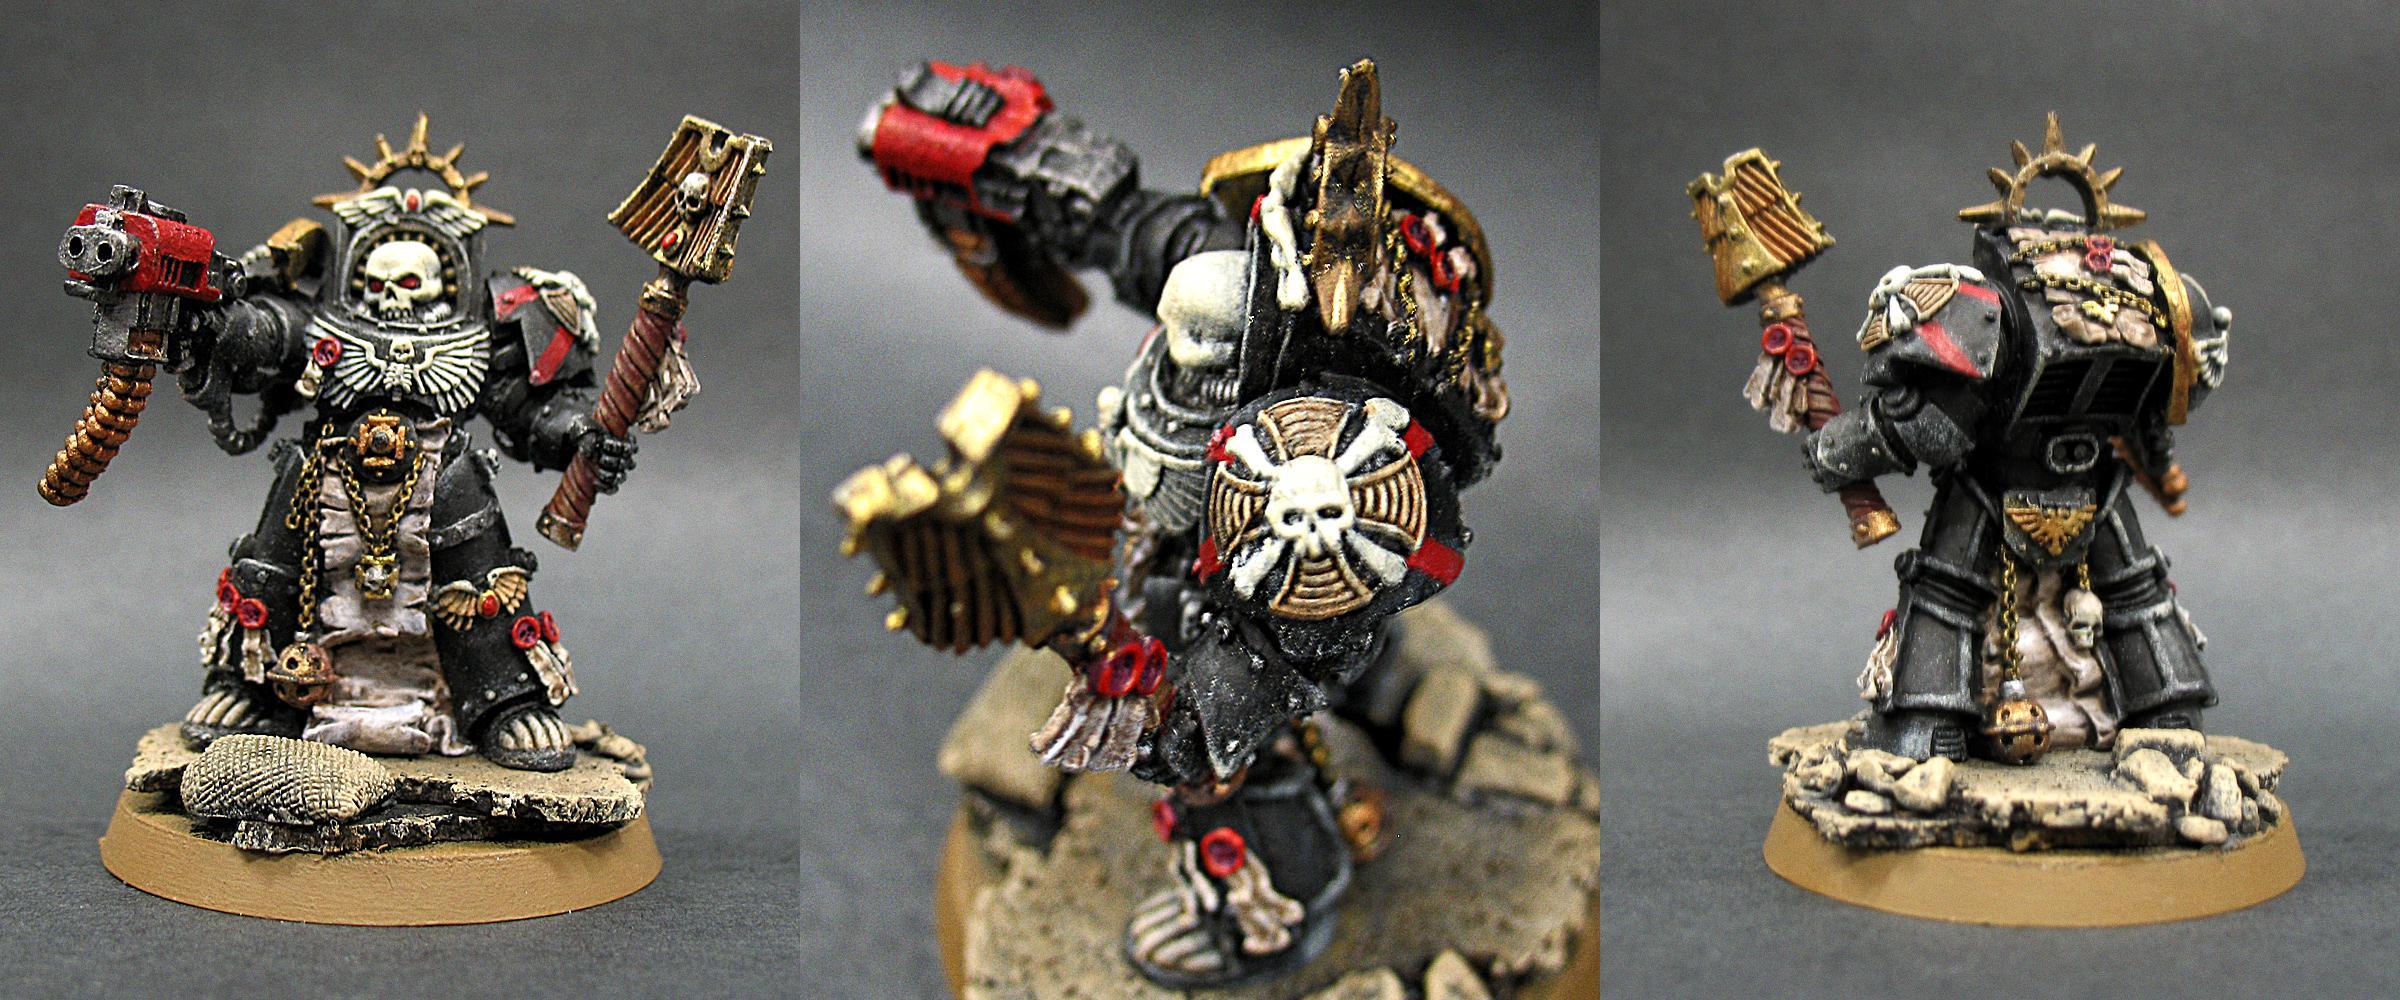 Blood Angels, Chaplain, Terminator Armor